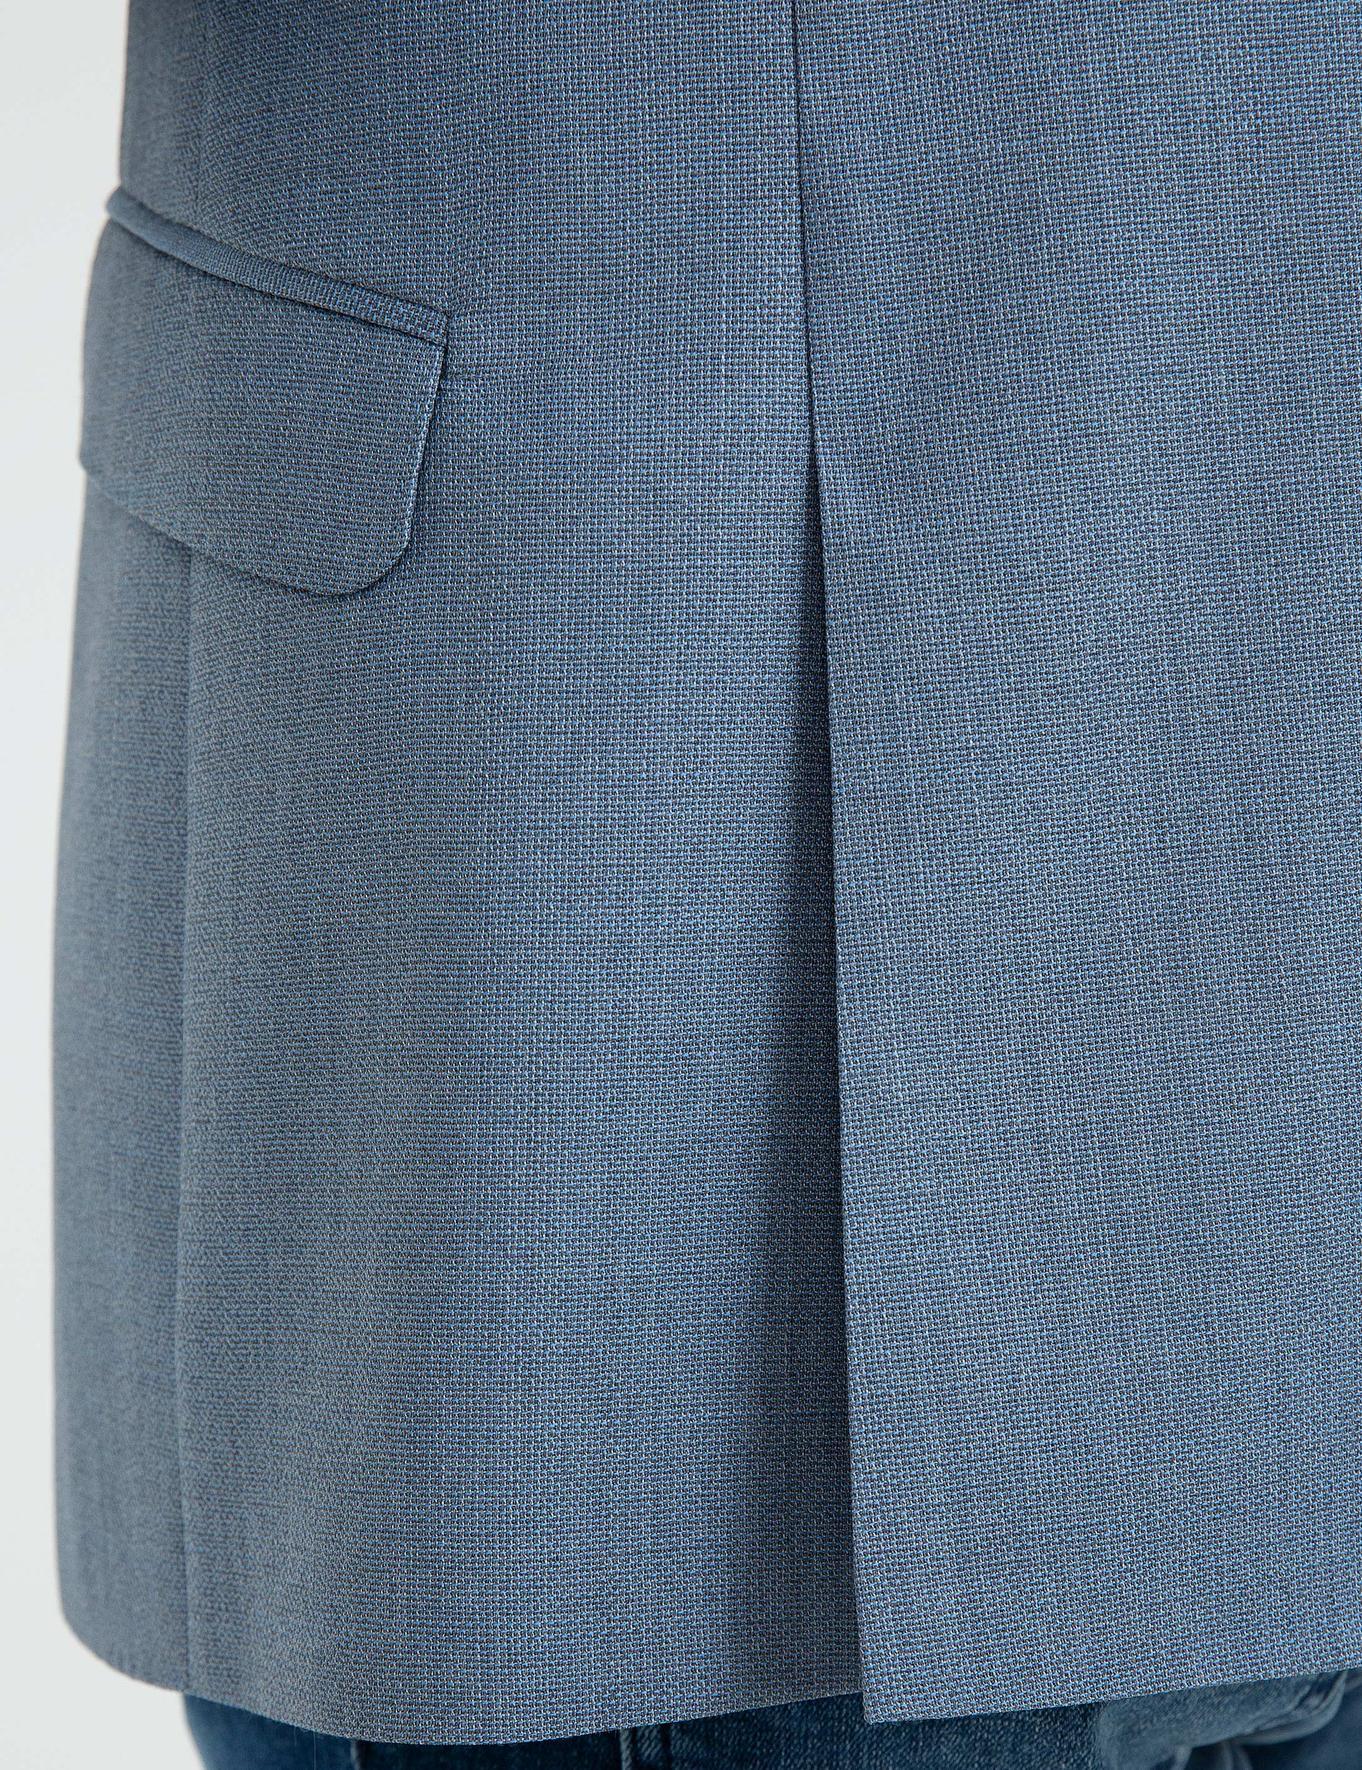 Mavi Slim Fit Ceket - 50185736041